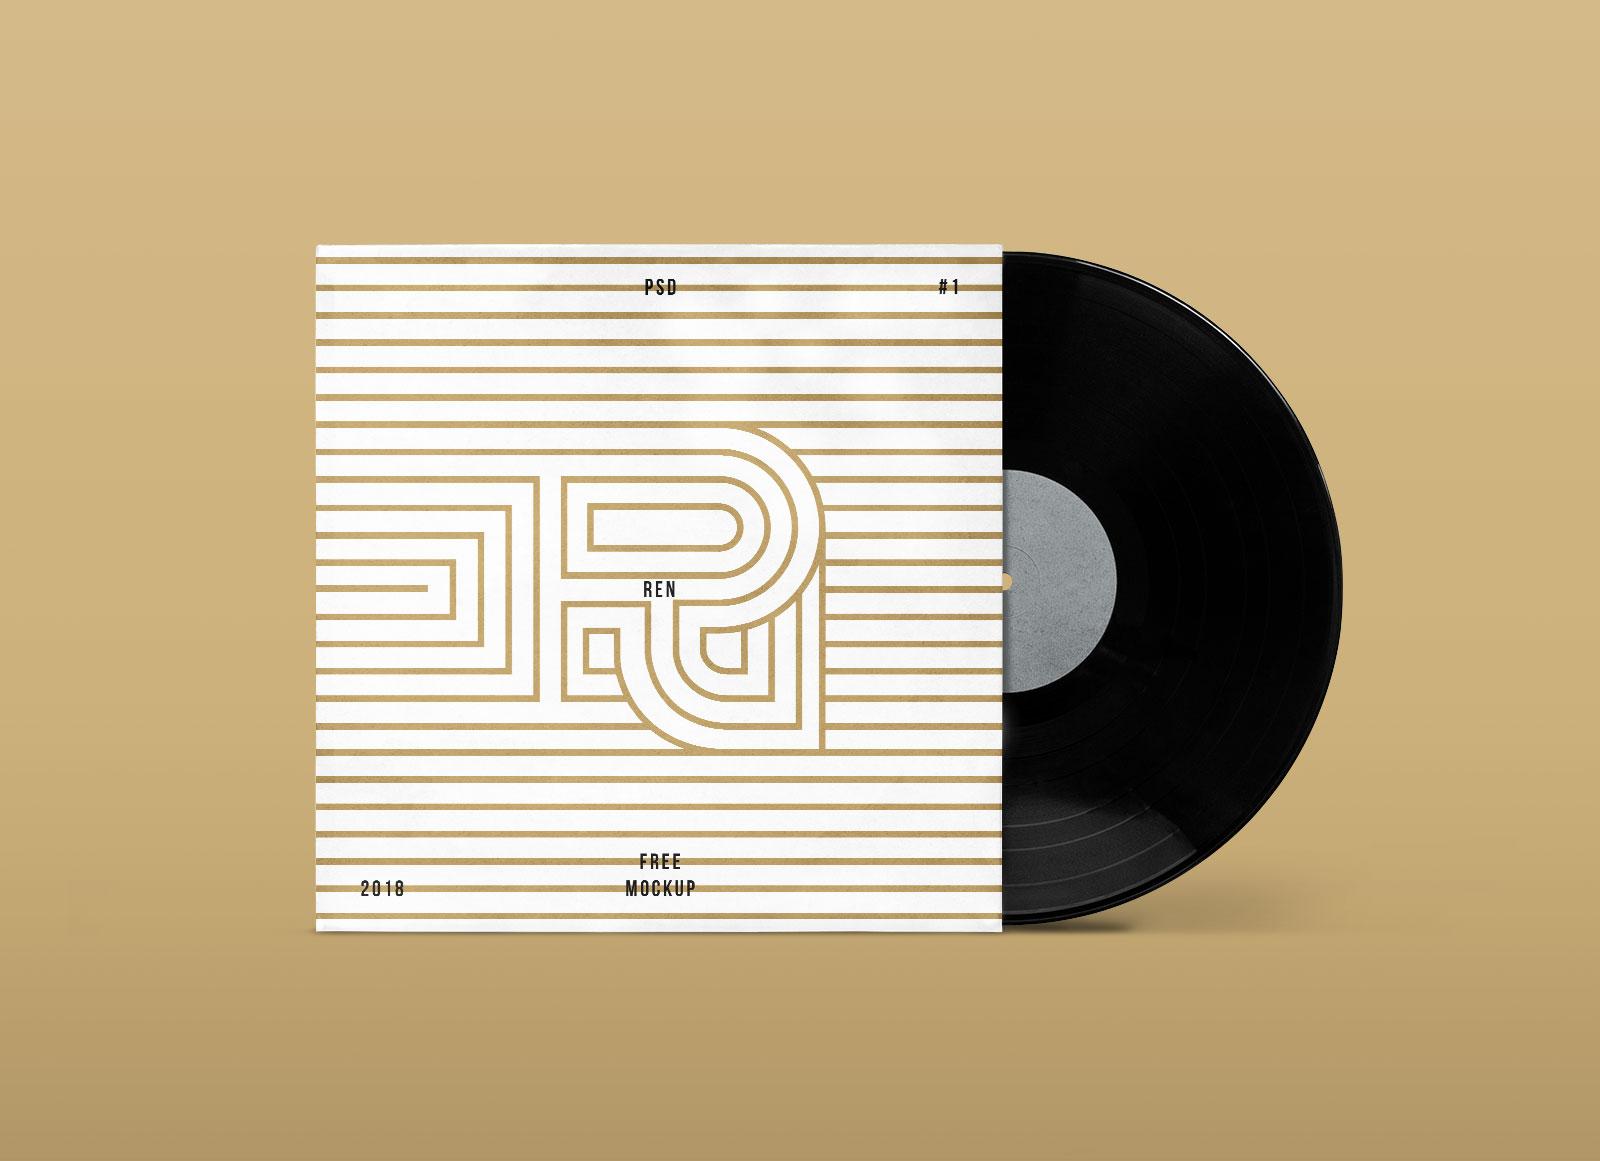 Free-Vinyl-Title-Packaging-Mockup-PSD